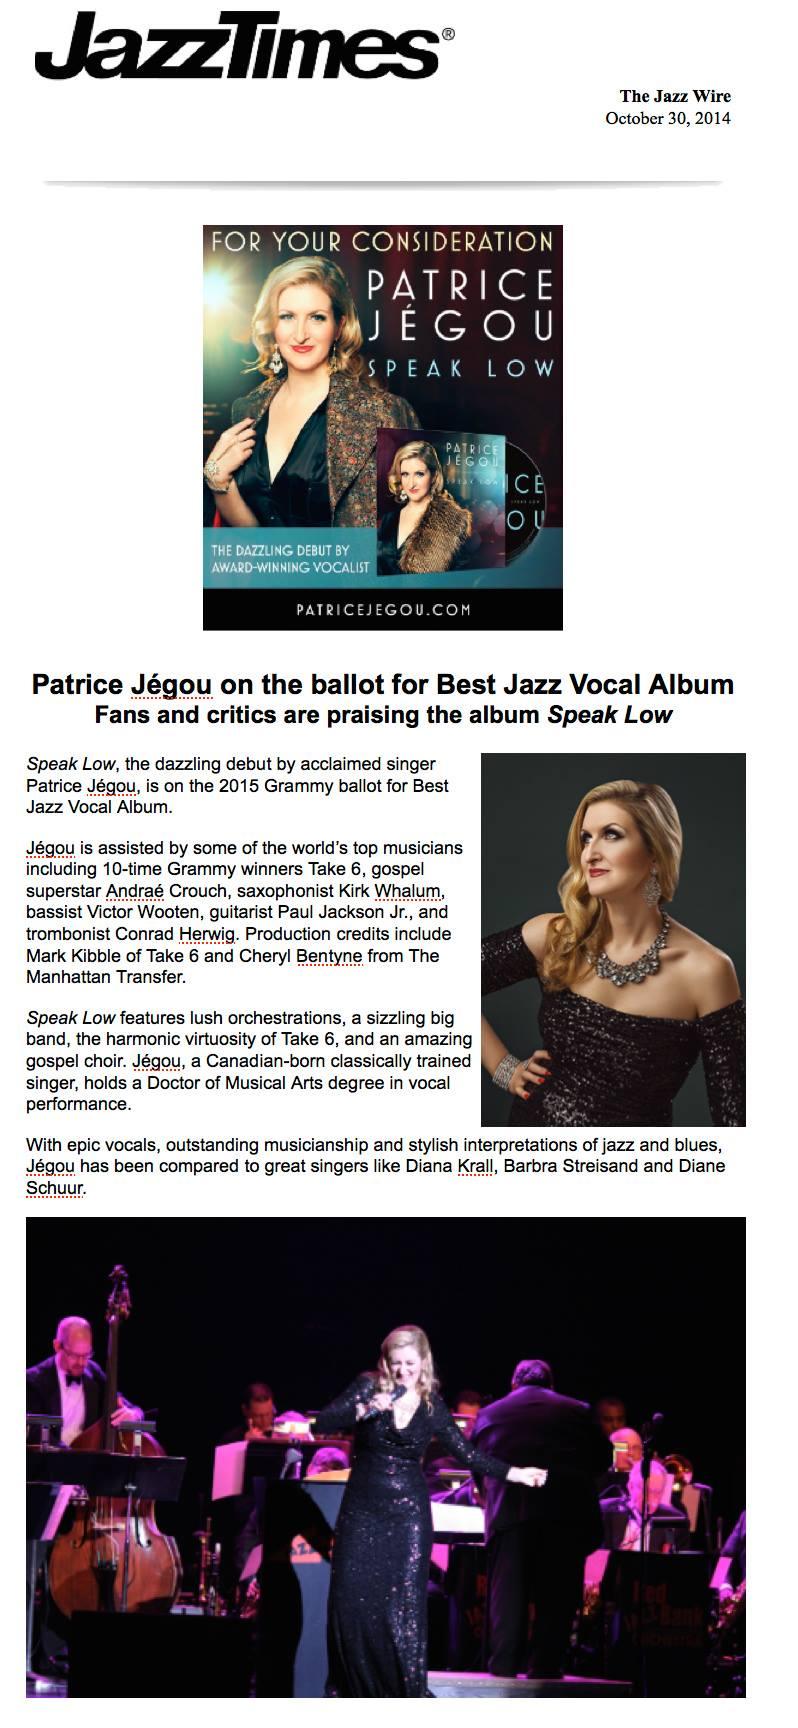 On the Grammy Ballot